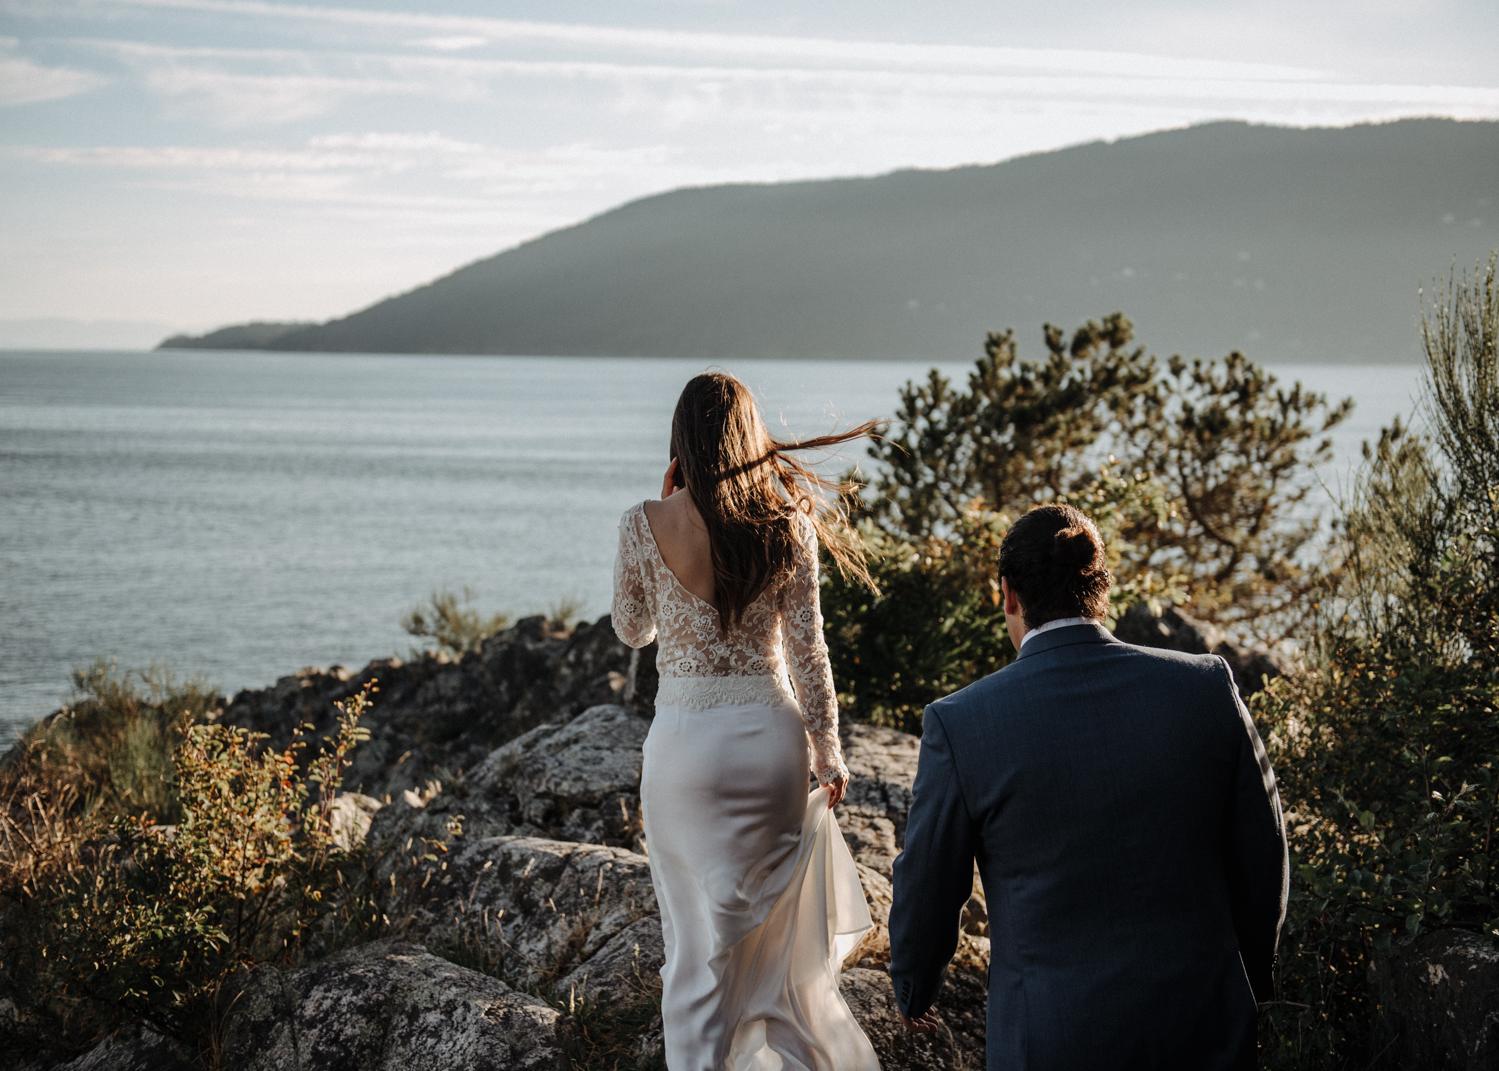 kaoverii_silva_photographer_lison_iman_wedding_websize-296.jpg